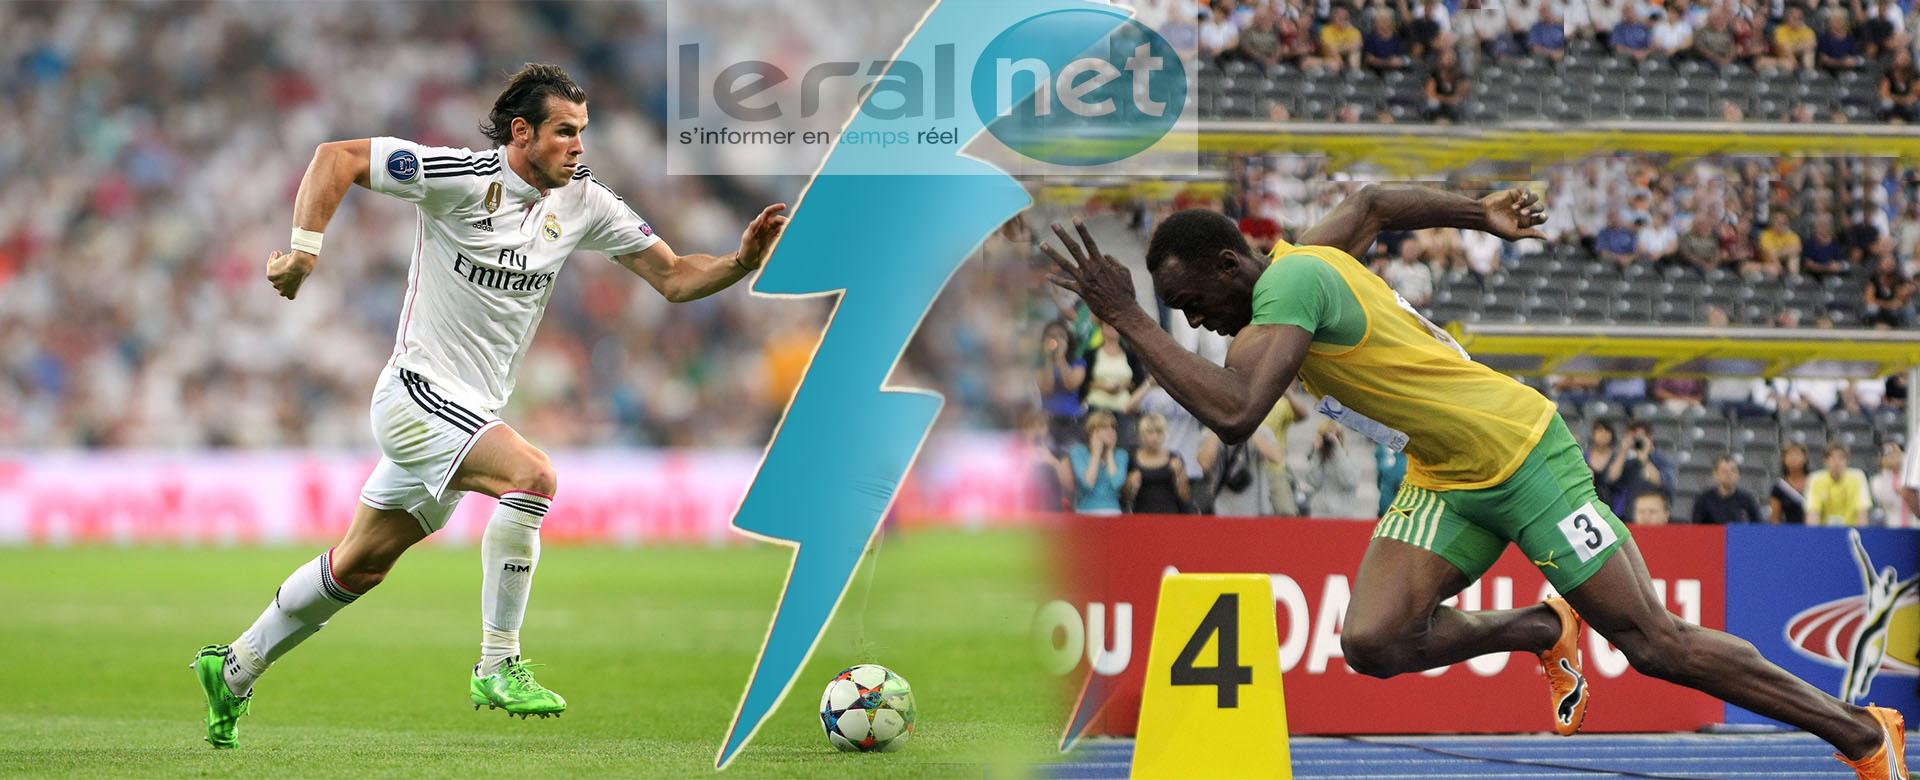 Gareth Bale: Serait-il aussi rapide qu'Usain Bolt ?